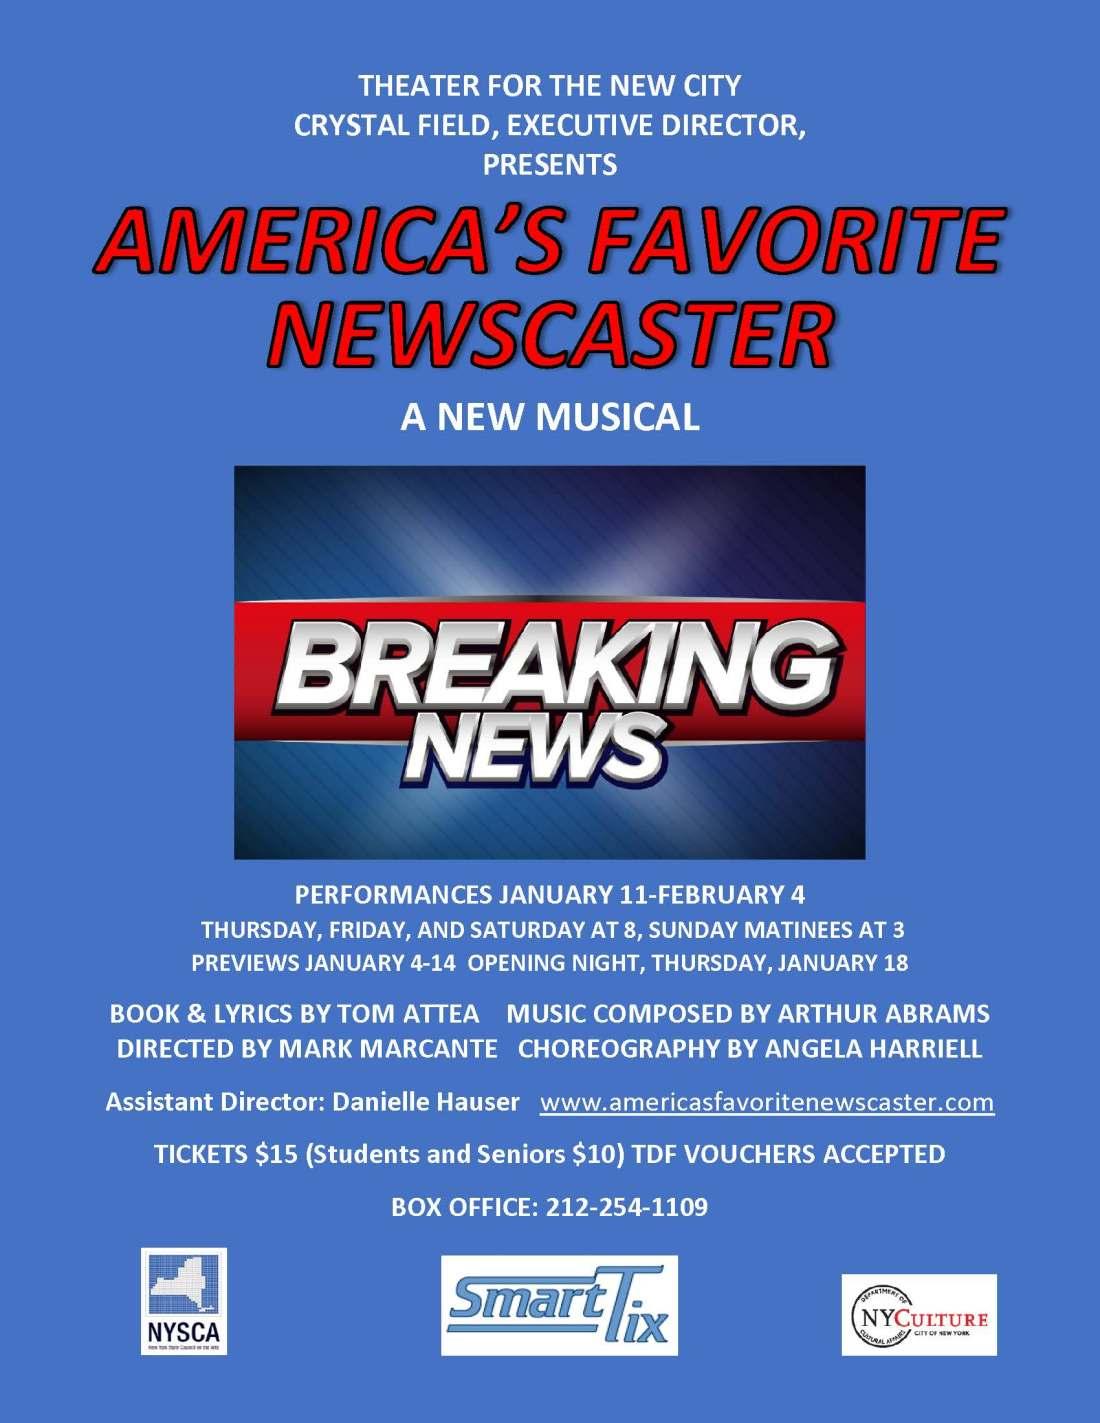 Americas Favorite Newscaster_Temporary Flyer